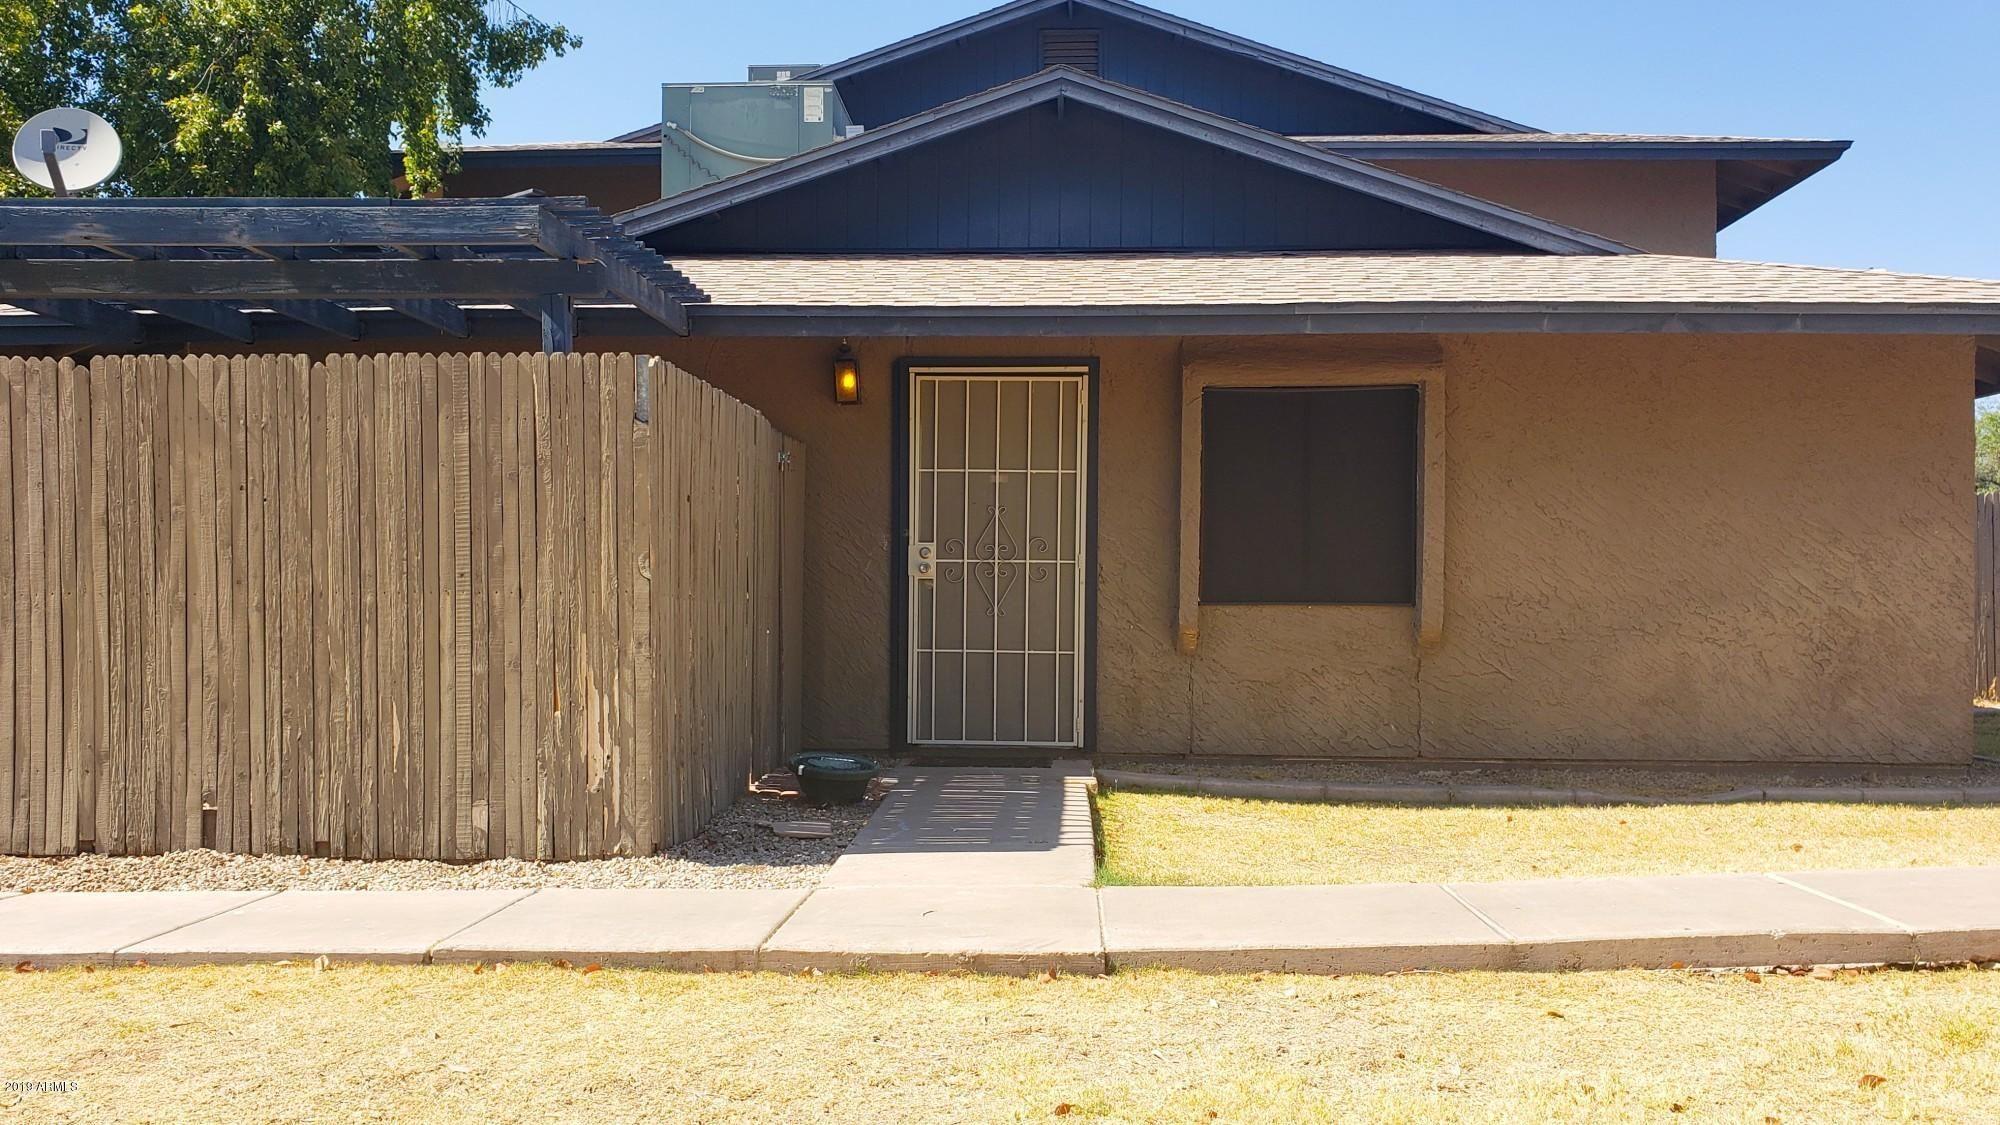 286  W PALOMINO 101  Drive Chandler AZ 85225